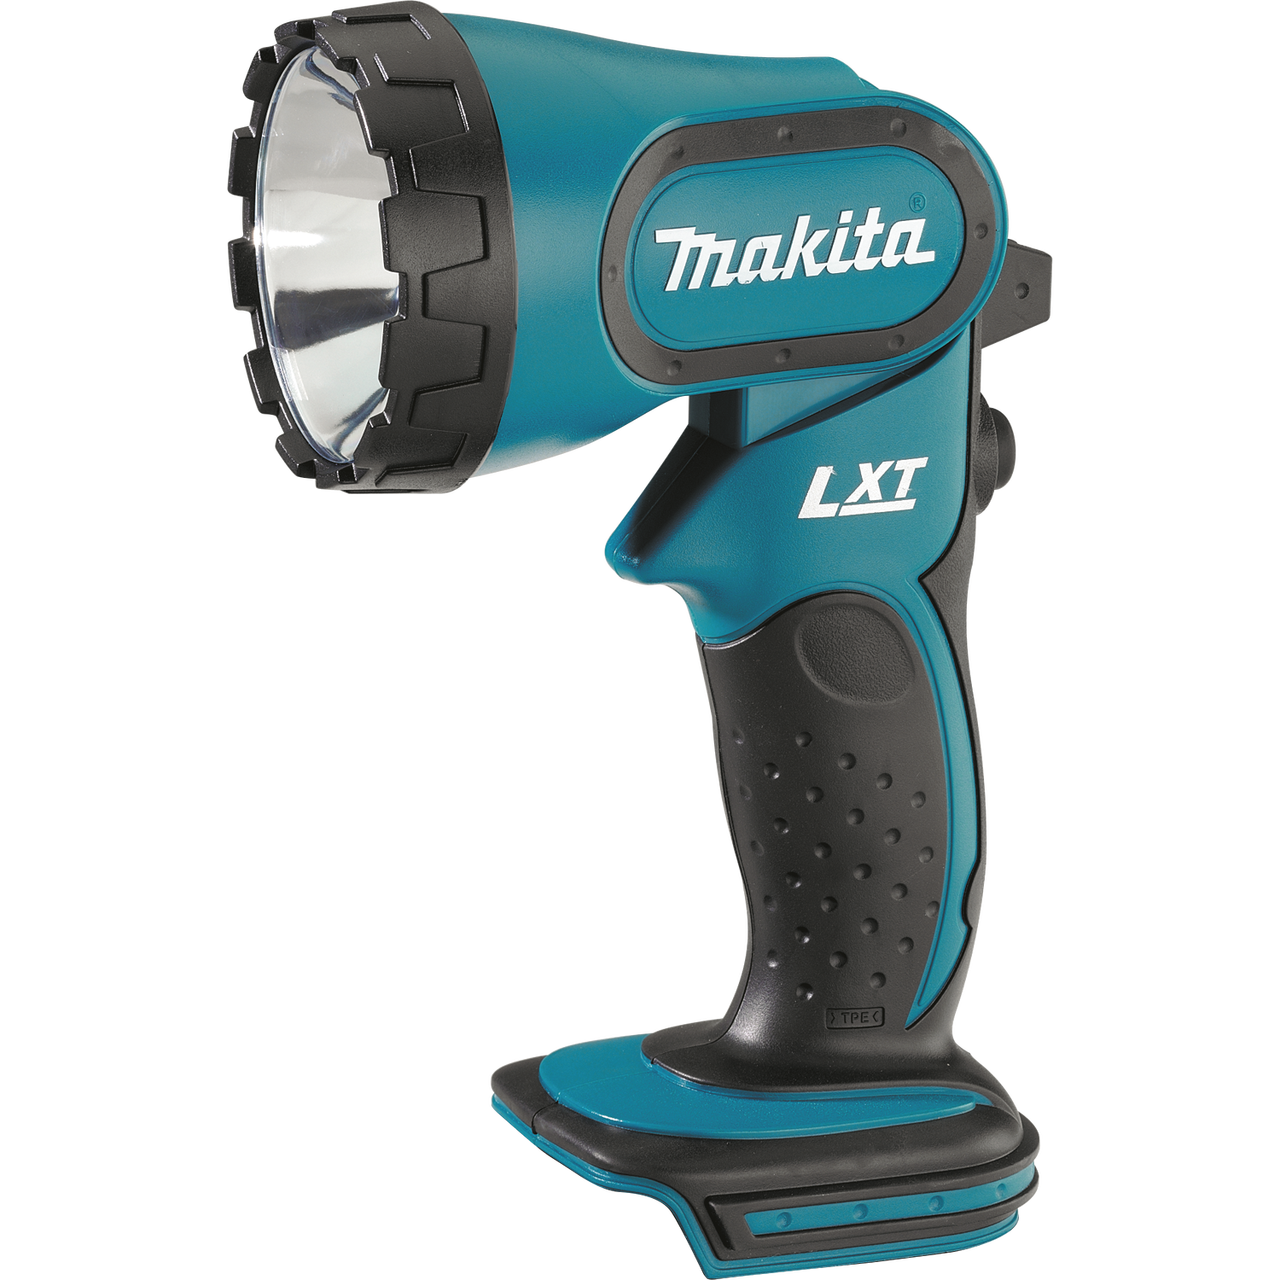 DML185 18V LXT Lithium-Ion Xenon Flashlight